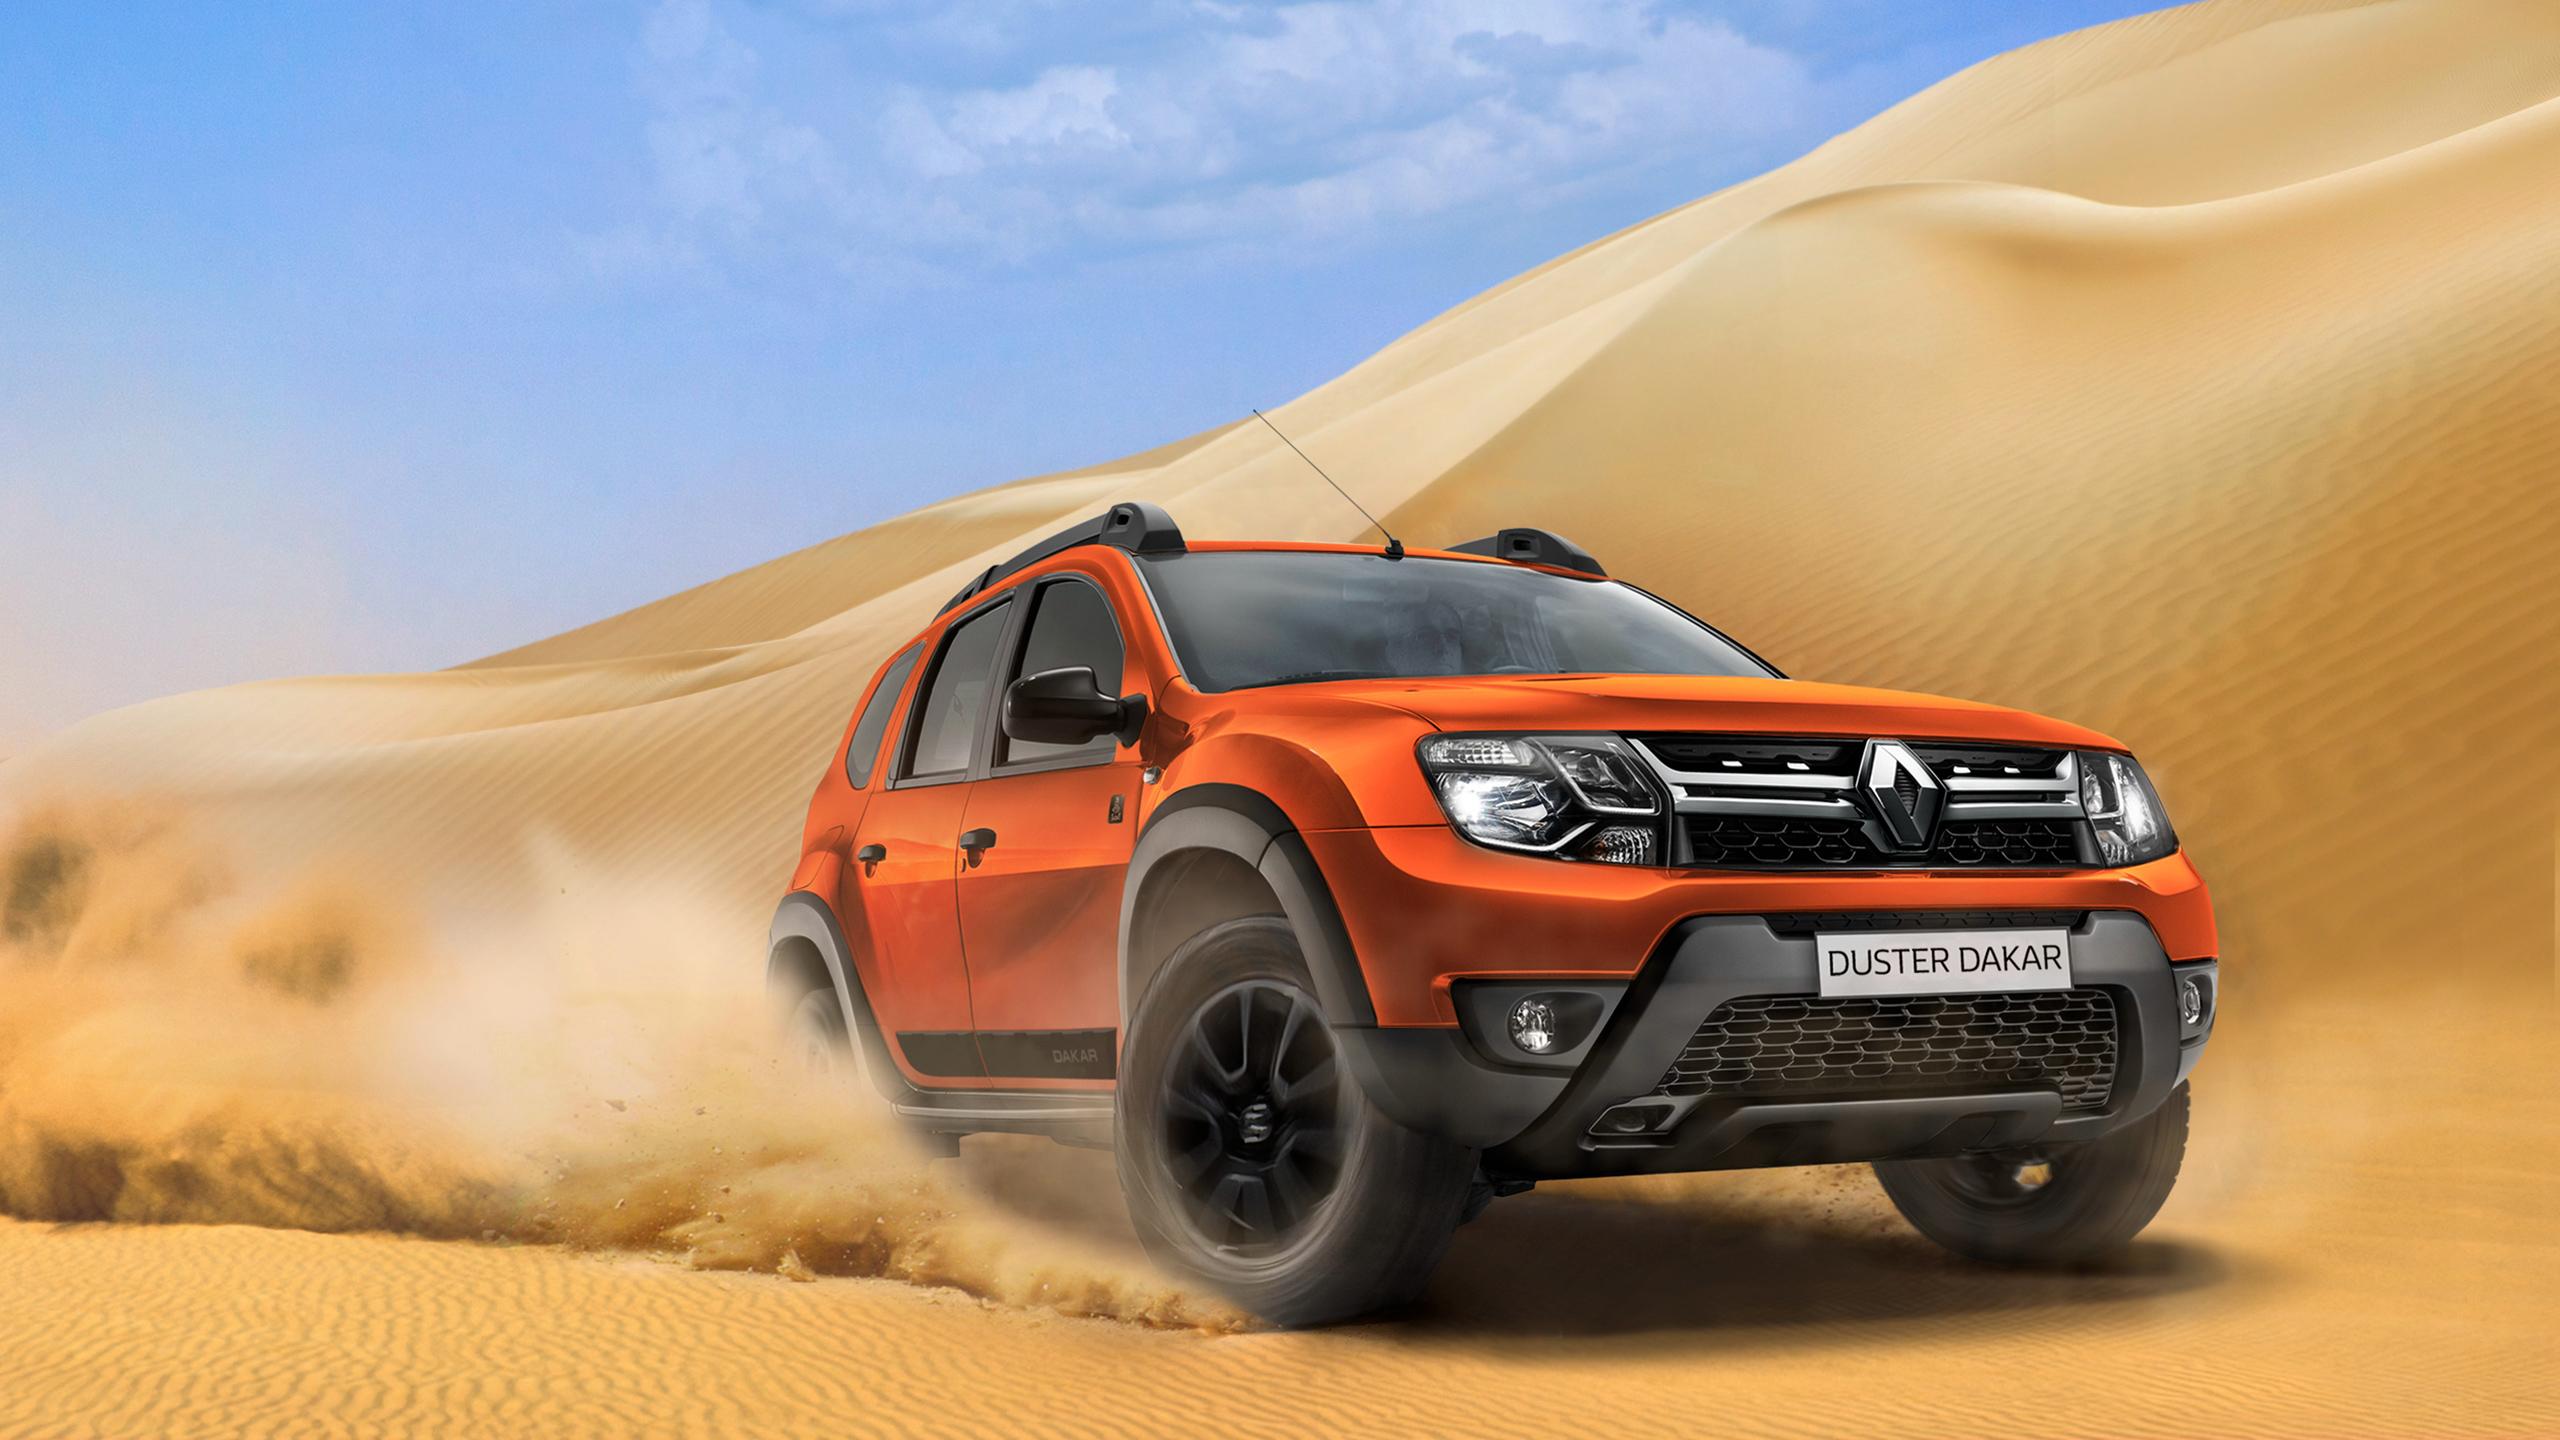 2018 Renault Duster Dakar Wallpaper Hd Car Wallpapers Id 10225